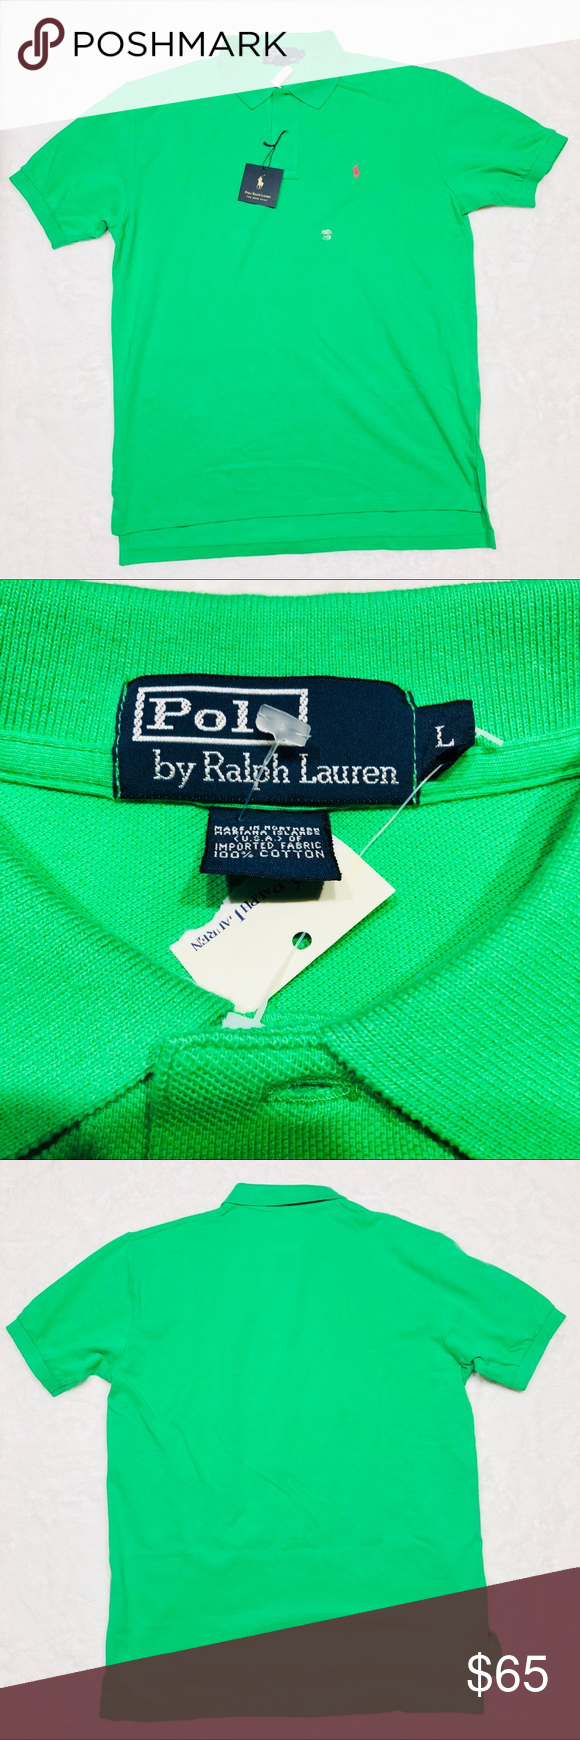 Ralph Lauren Green Polo Shirt Nwt In 2018 My Posh Picks Green